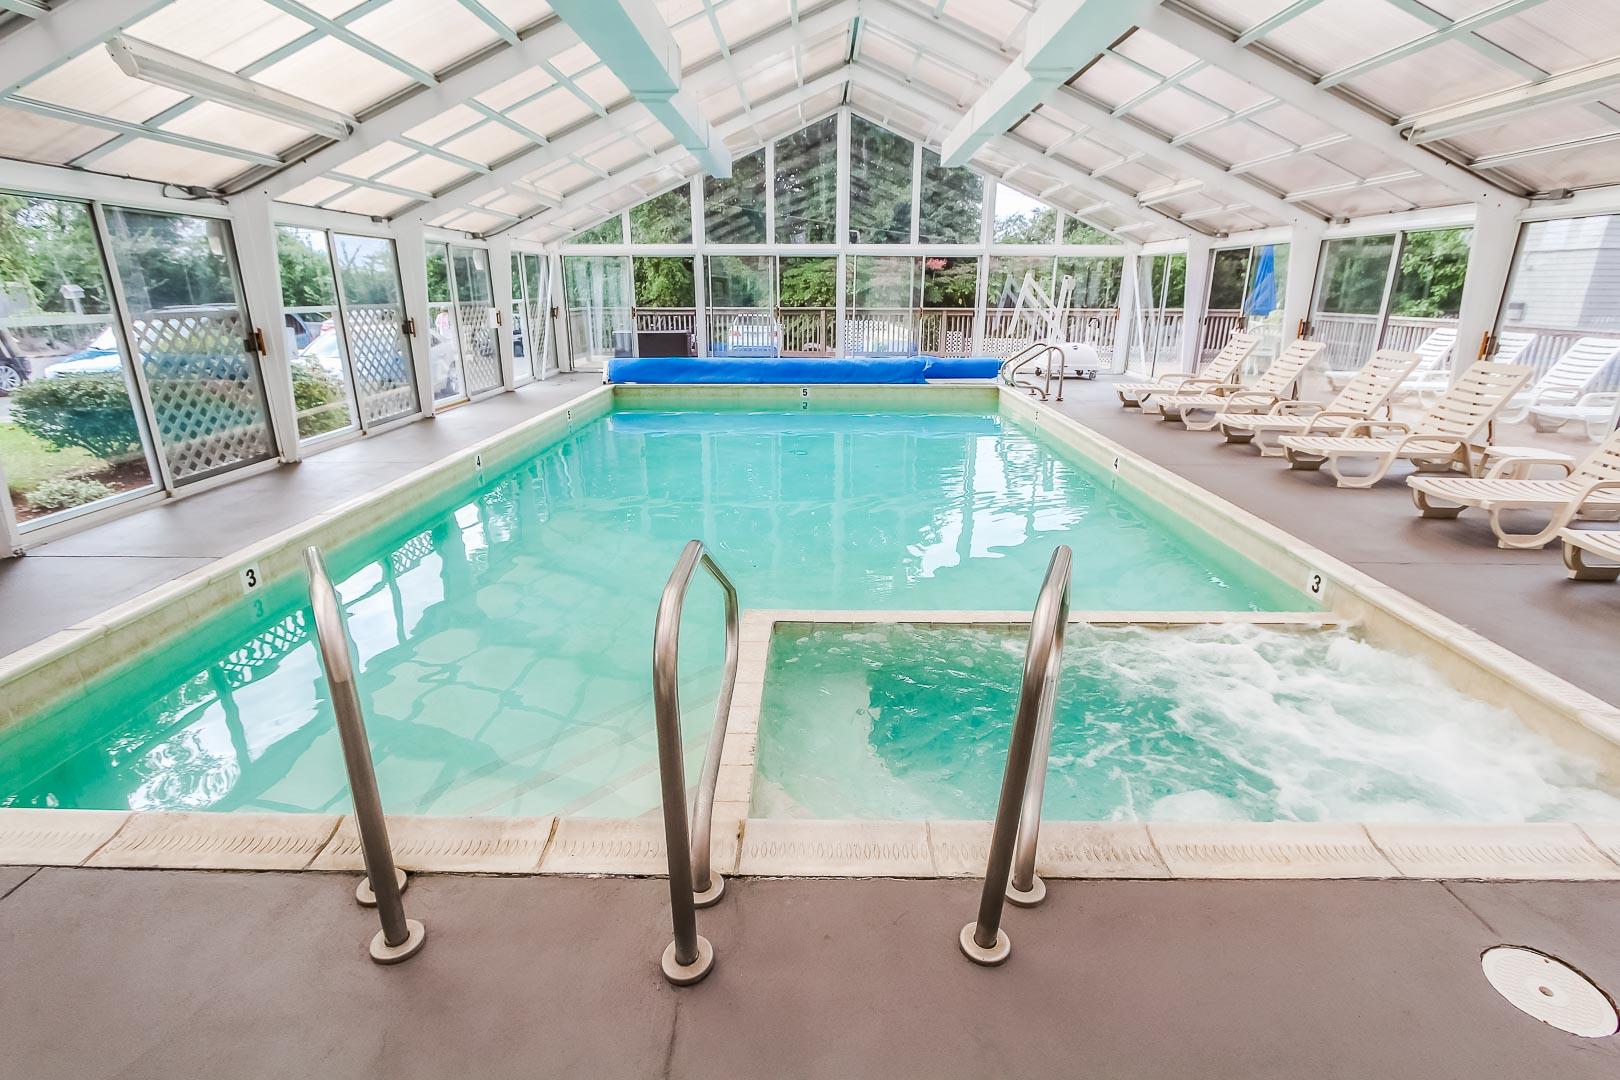 A soothing indoor pool at VRI's Oceancliff Resort in Rhode Island.